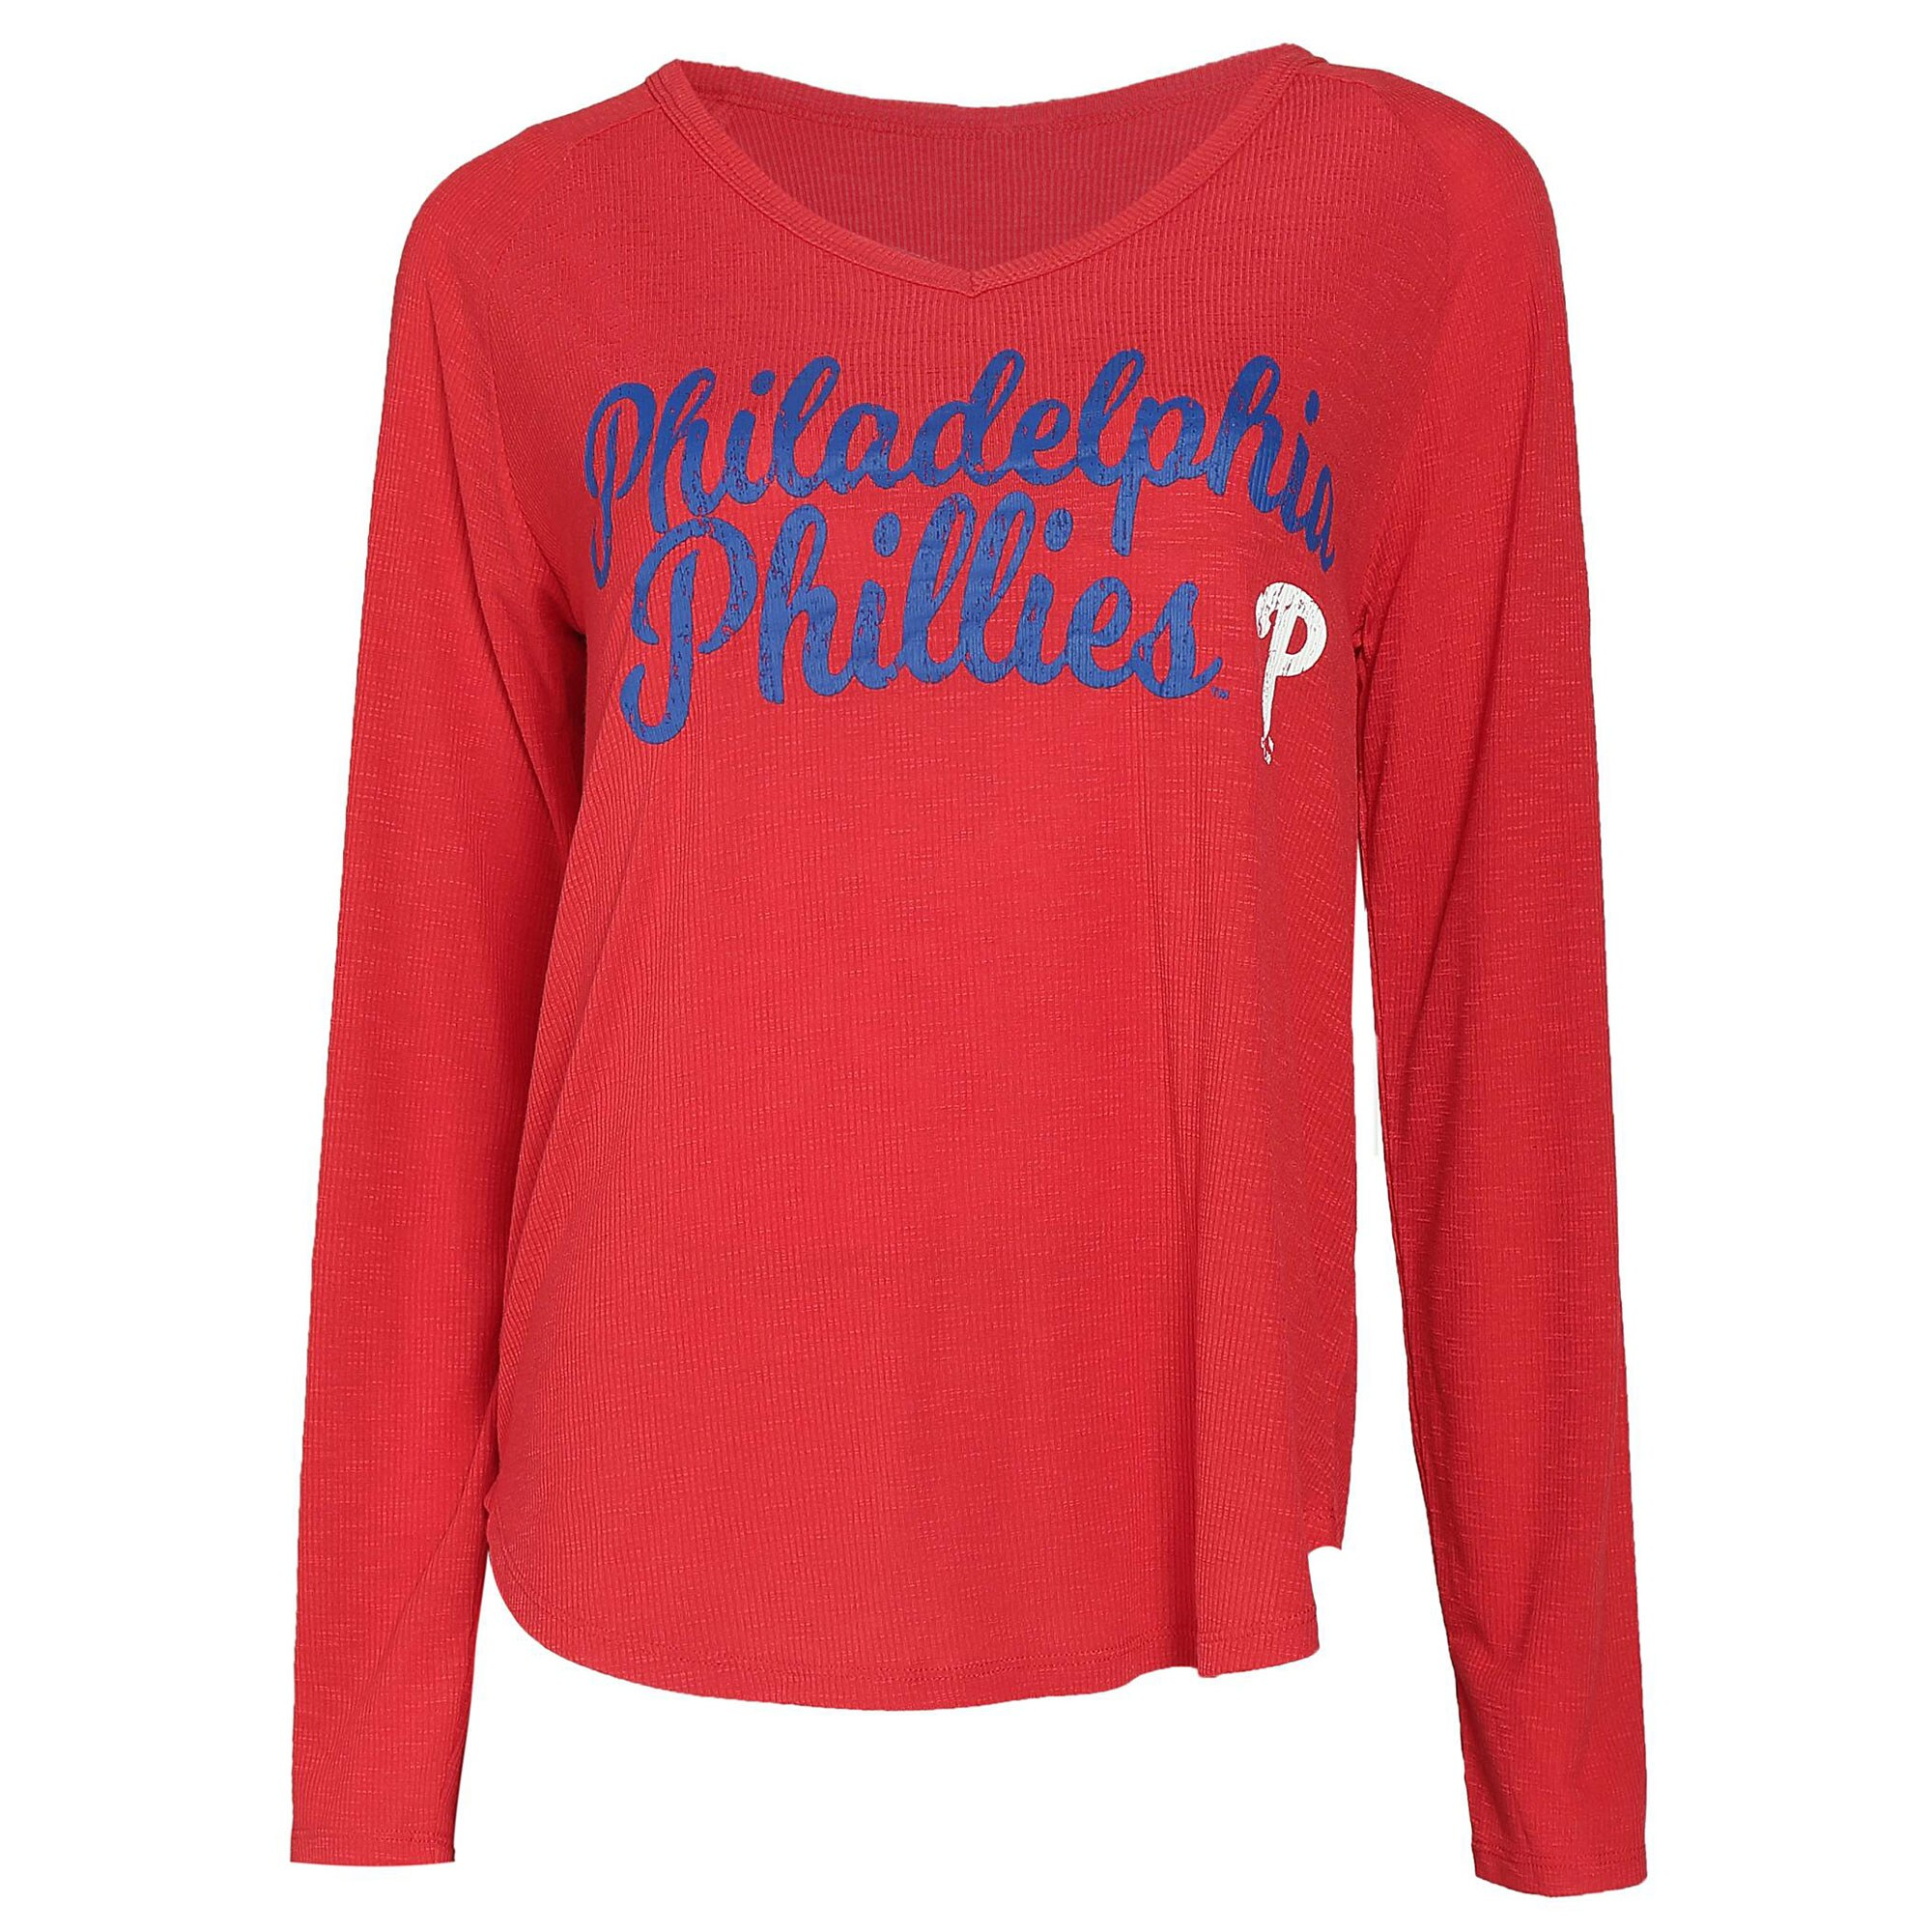 Philadelphia Phillies Concepts Sport Women's Composure Long Sleeve Top - Red